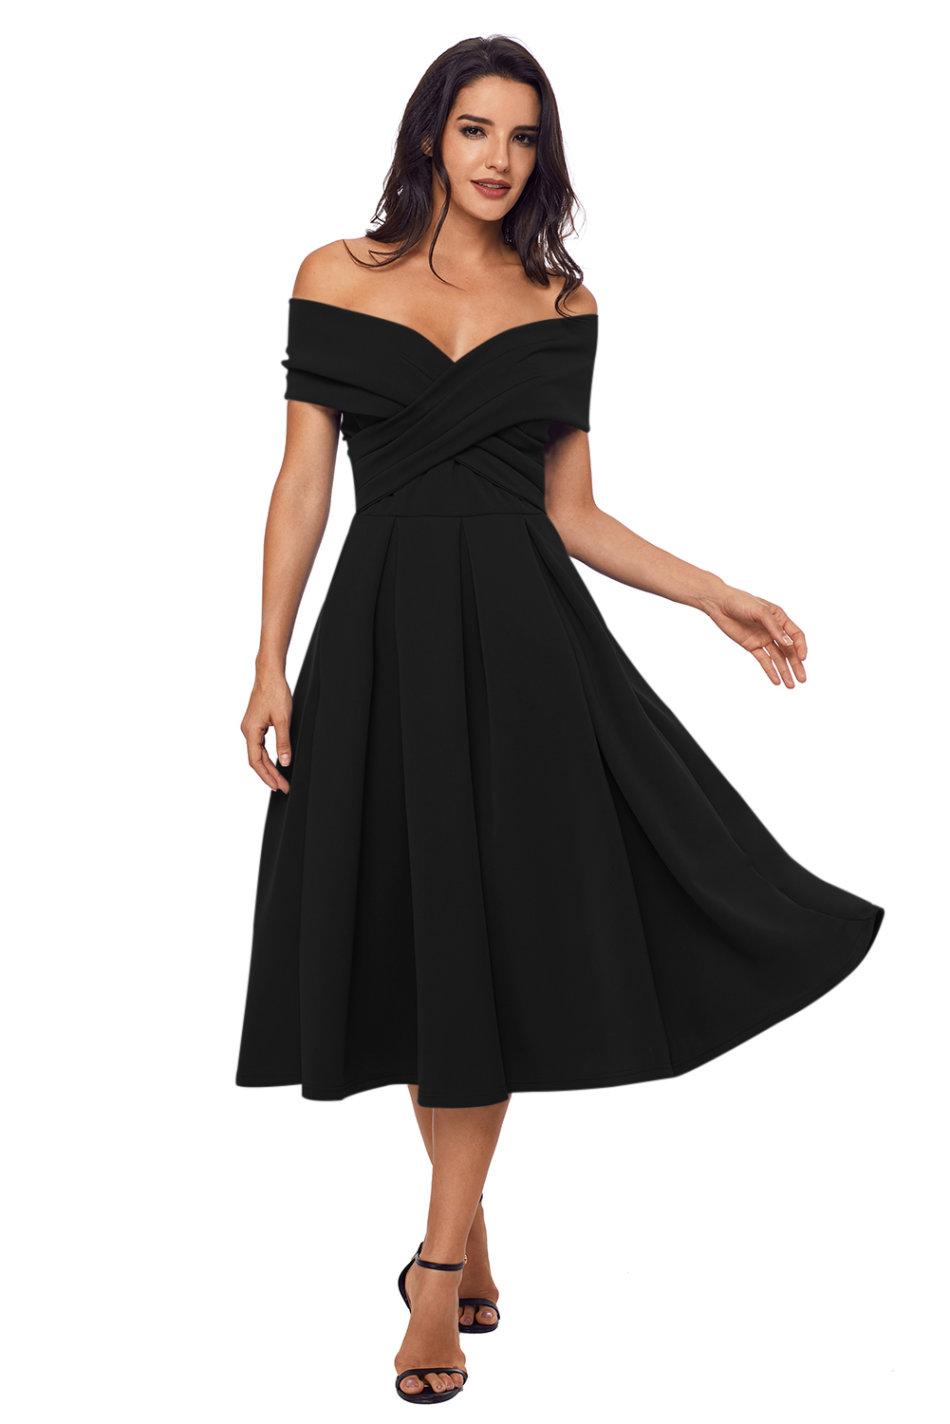 c401486d0e49 Formal Dresses - Black Midi Evening Dresses was listed for R706.82 ...